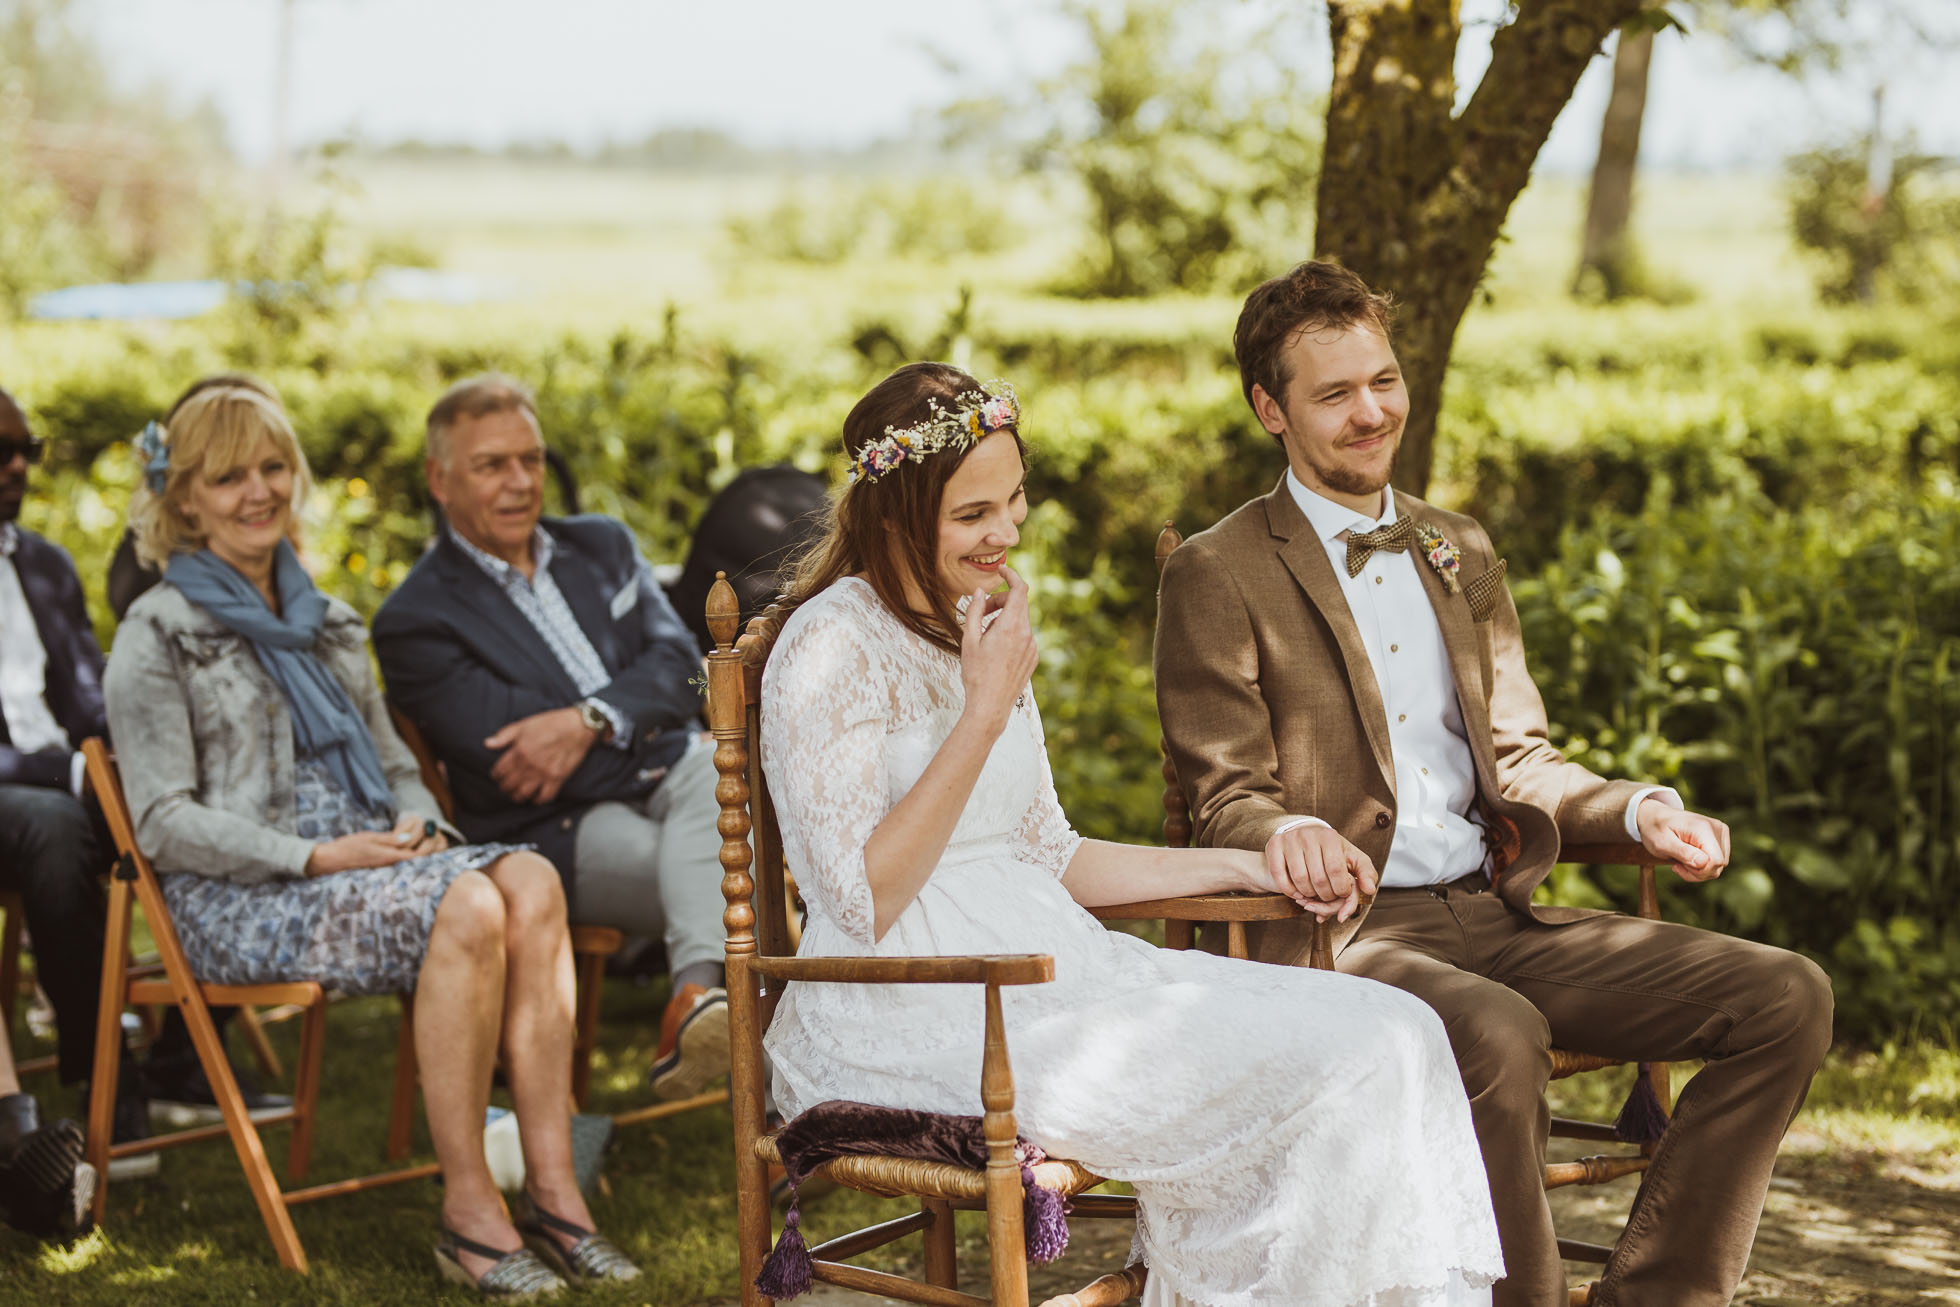 utrecht-wedding-photographer-67.jpg